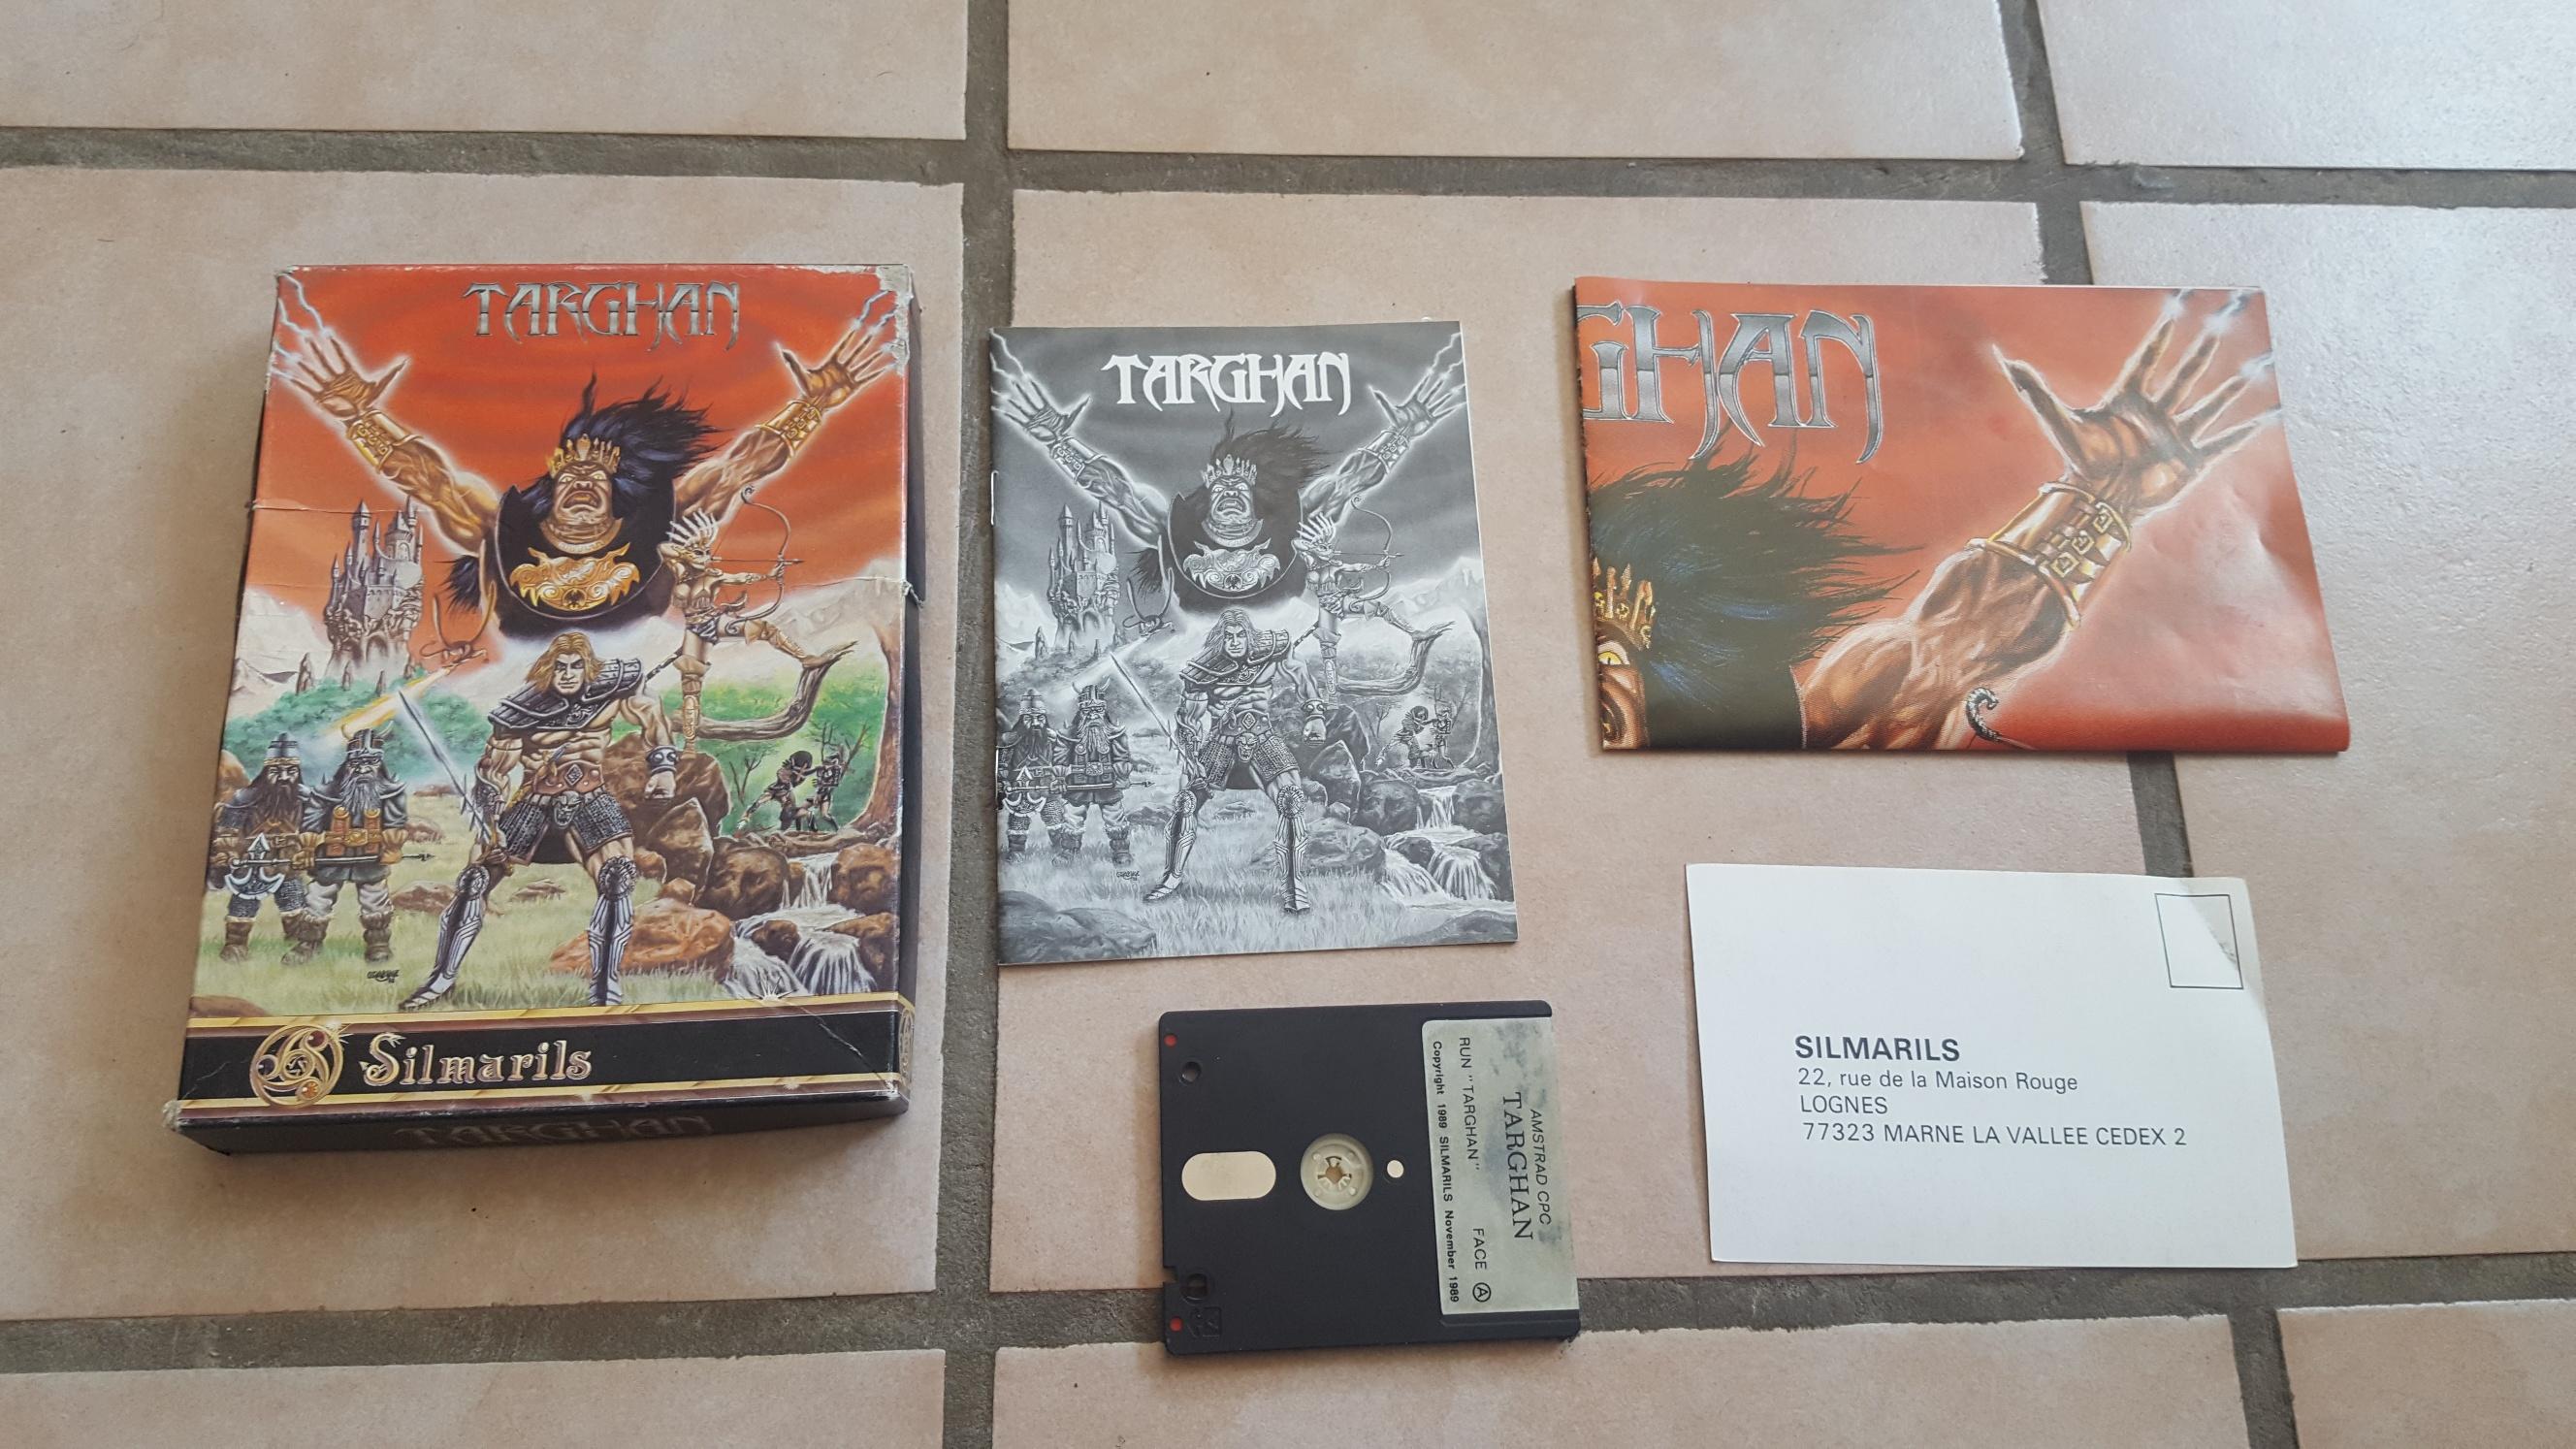 Vente ordinateurs et jeux Atari, Amiga, Amstrad et PC MAJ 20/01 - Page 6 NV3bK